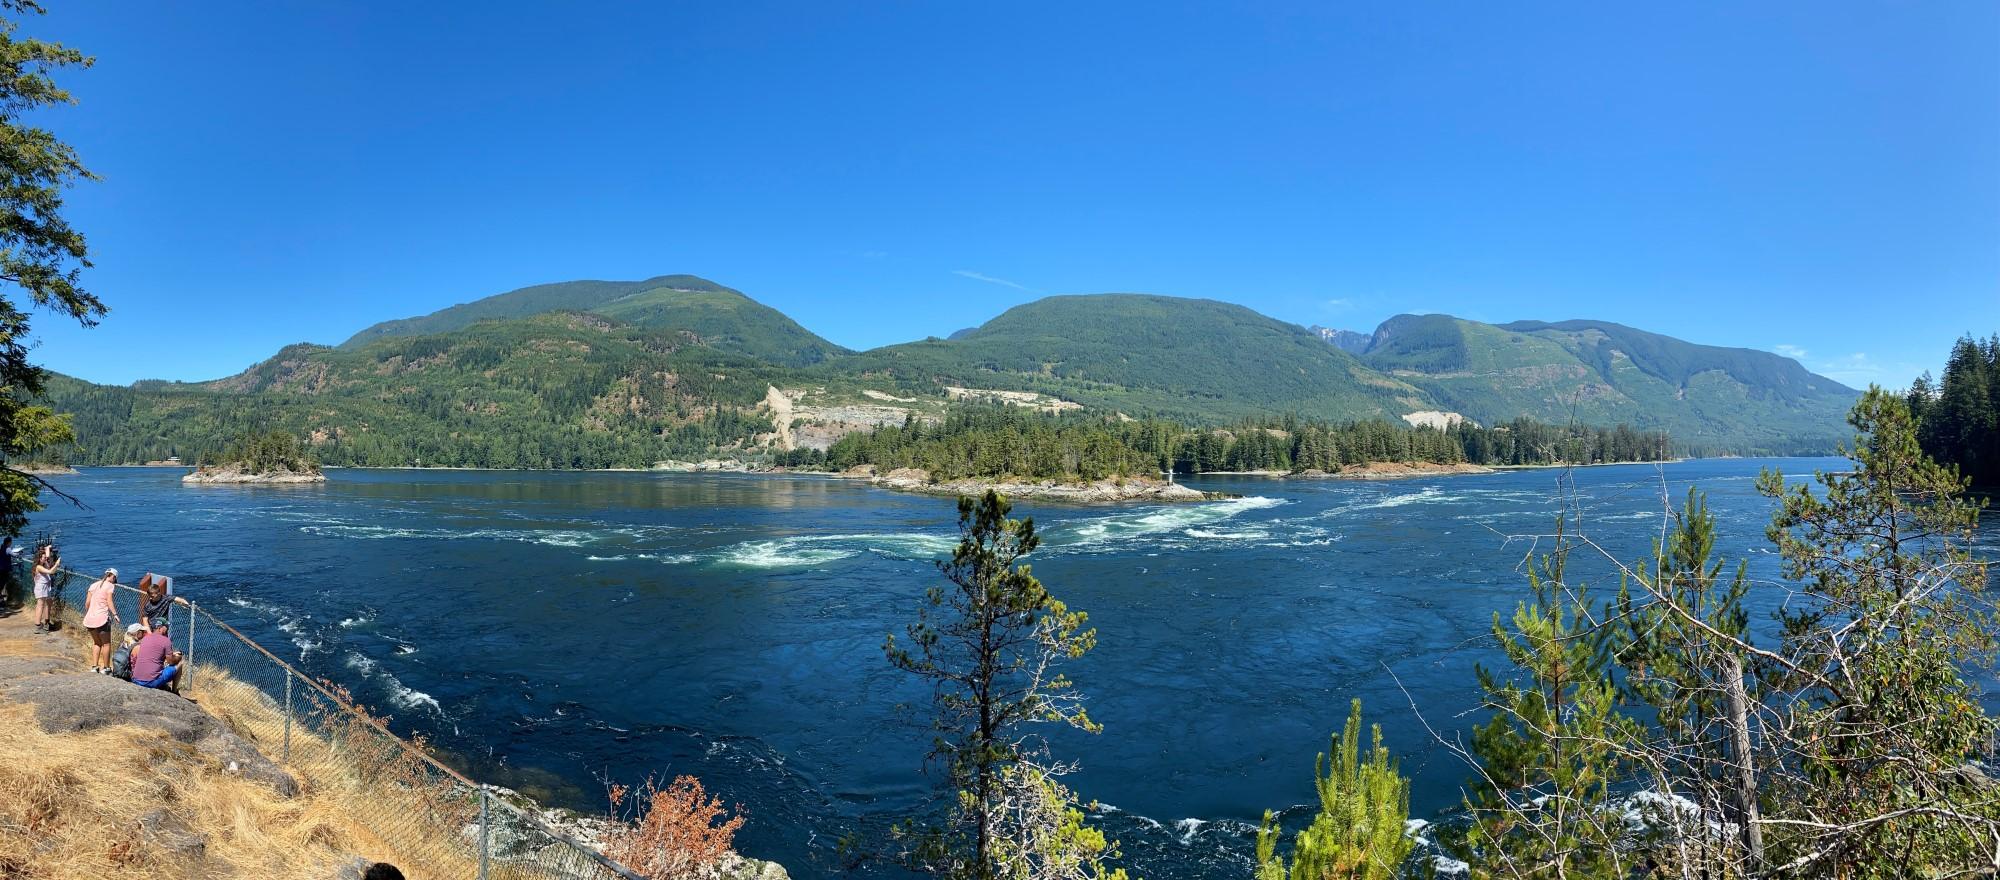 Check Out Skookumchuck Narrows on British Columbia's Sunshine Coast